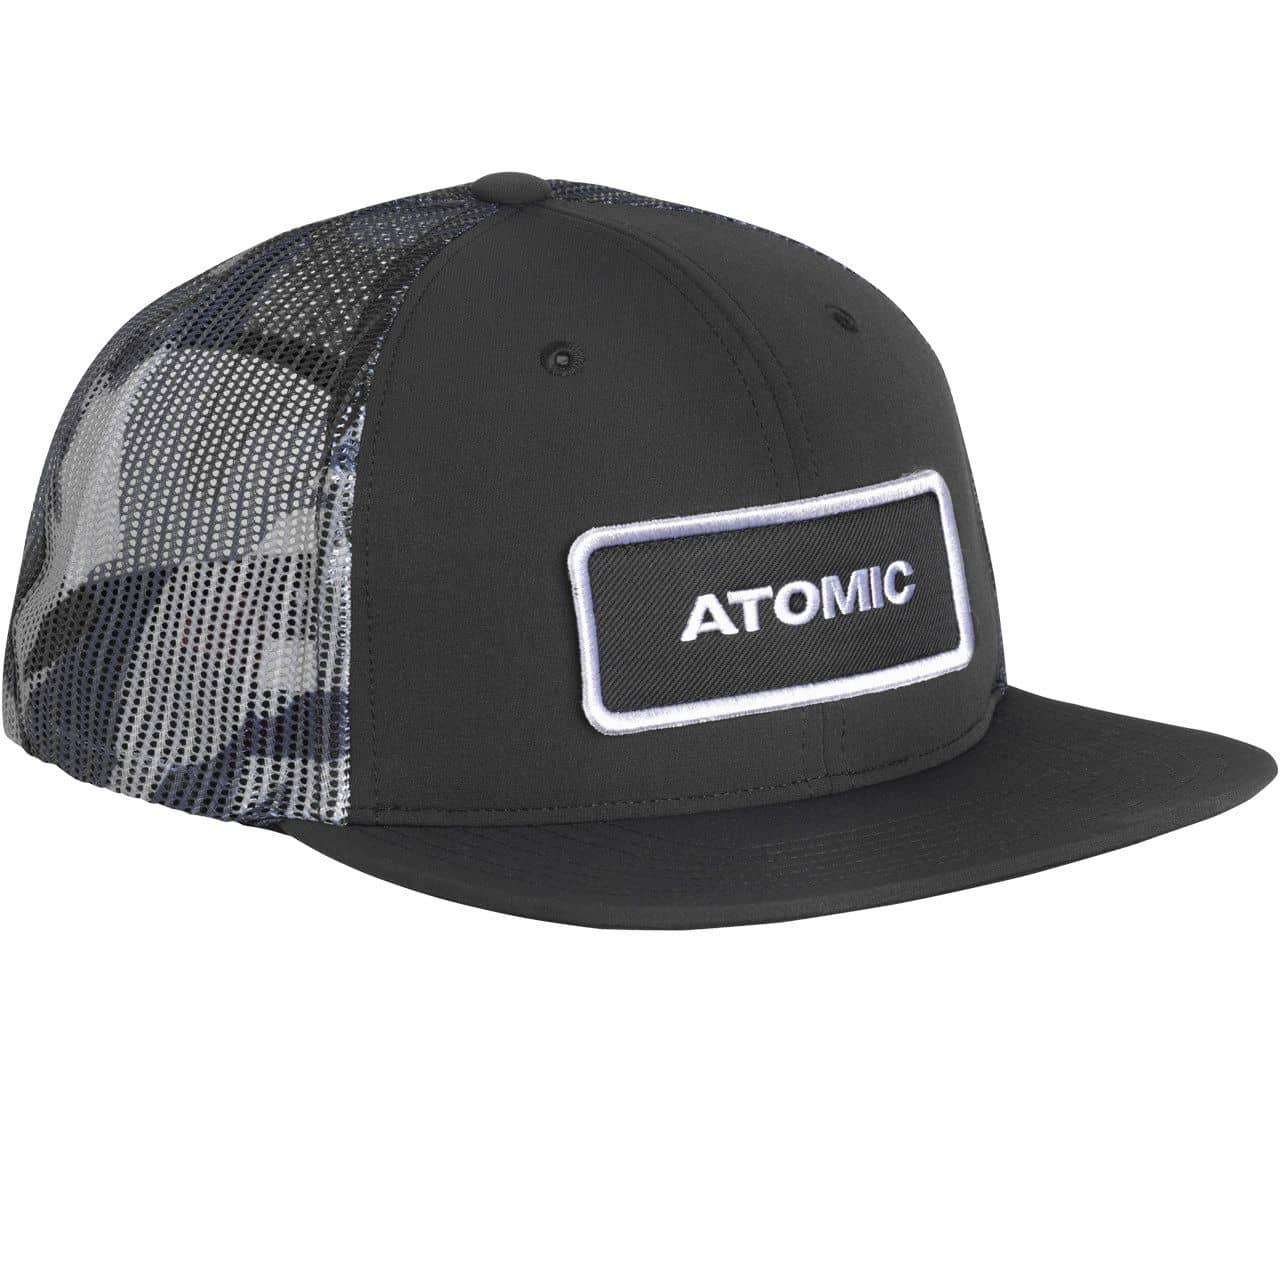 Atomic Skiwear Atomic Men Trucker Cap ALPS black